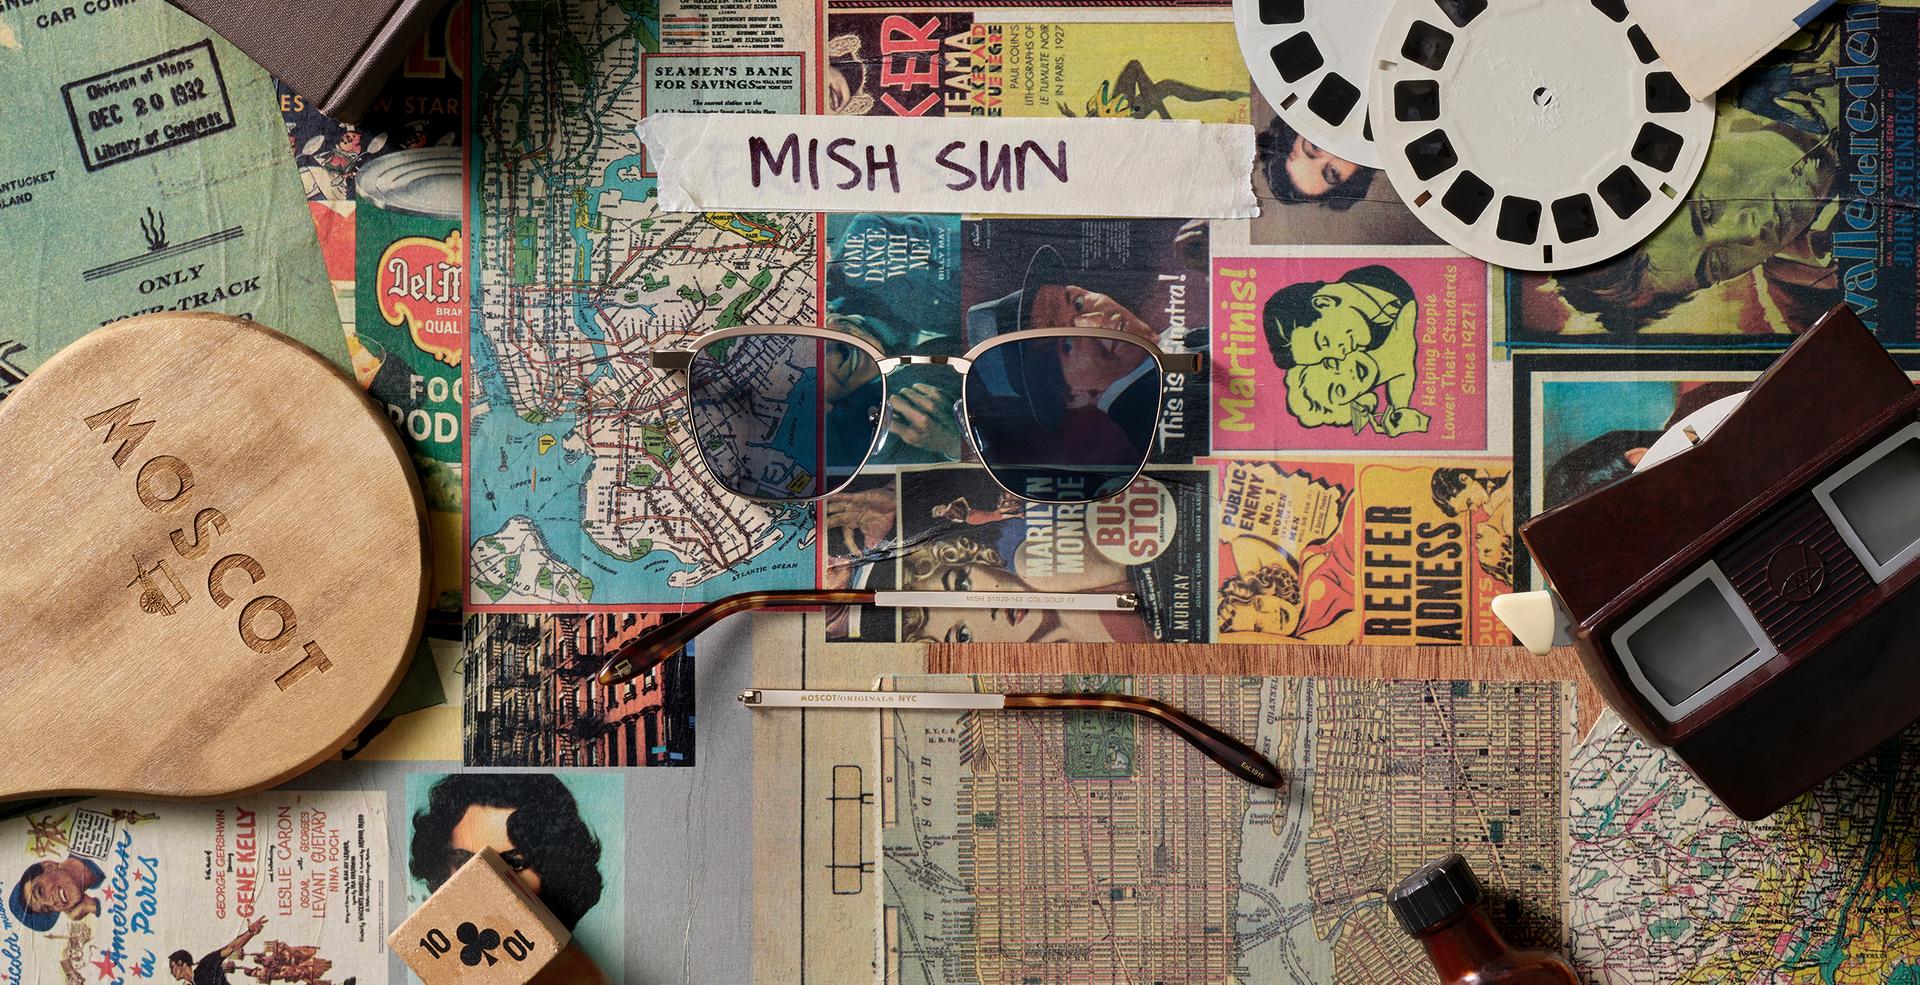 MISH SUN